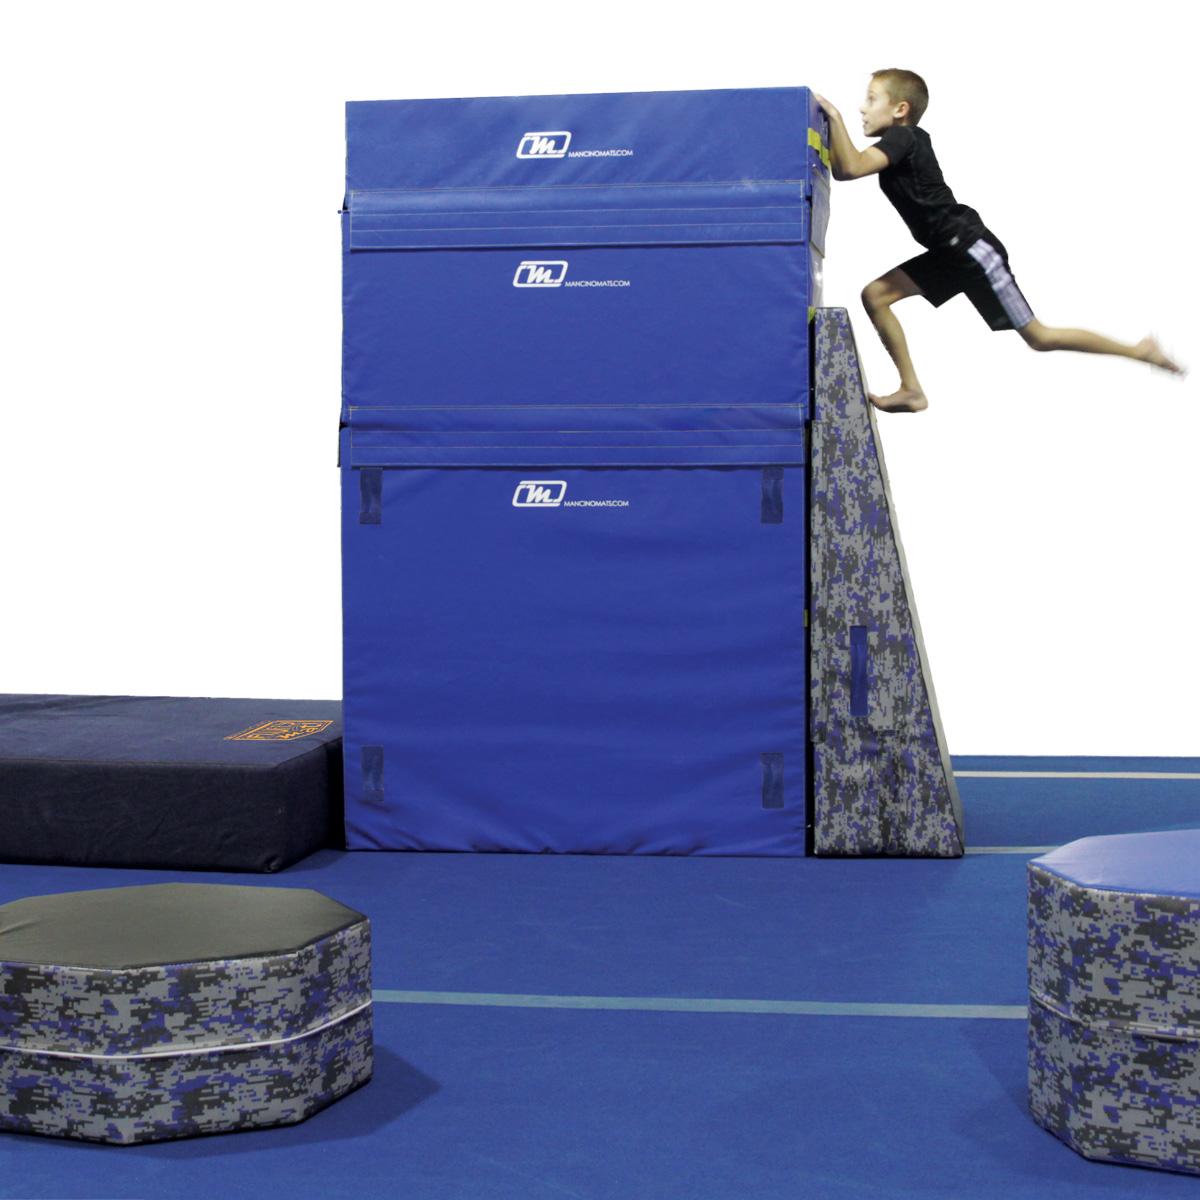 ninja warrior warped wall for gyms